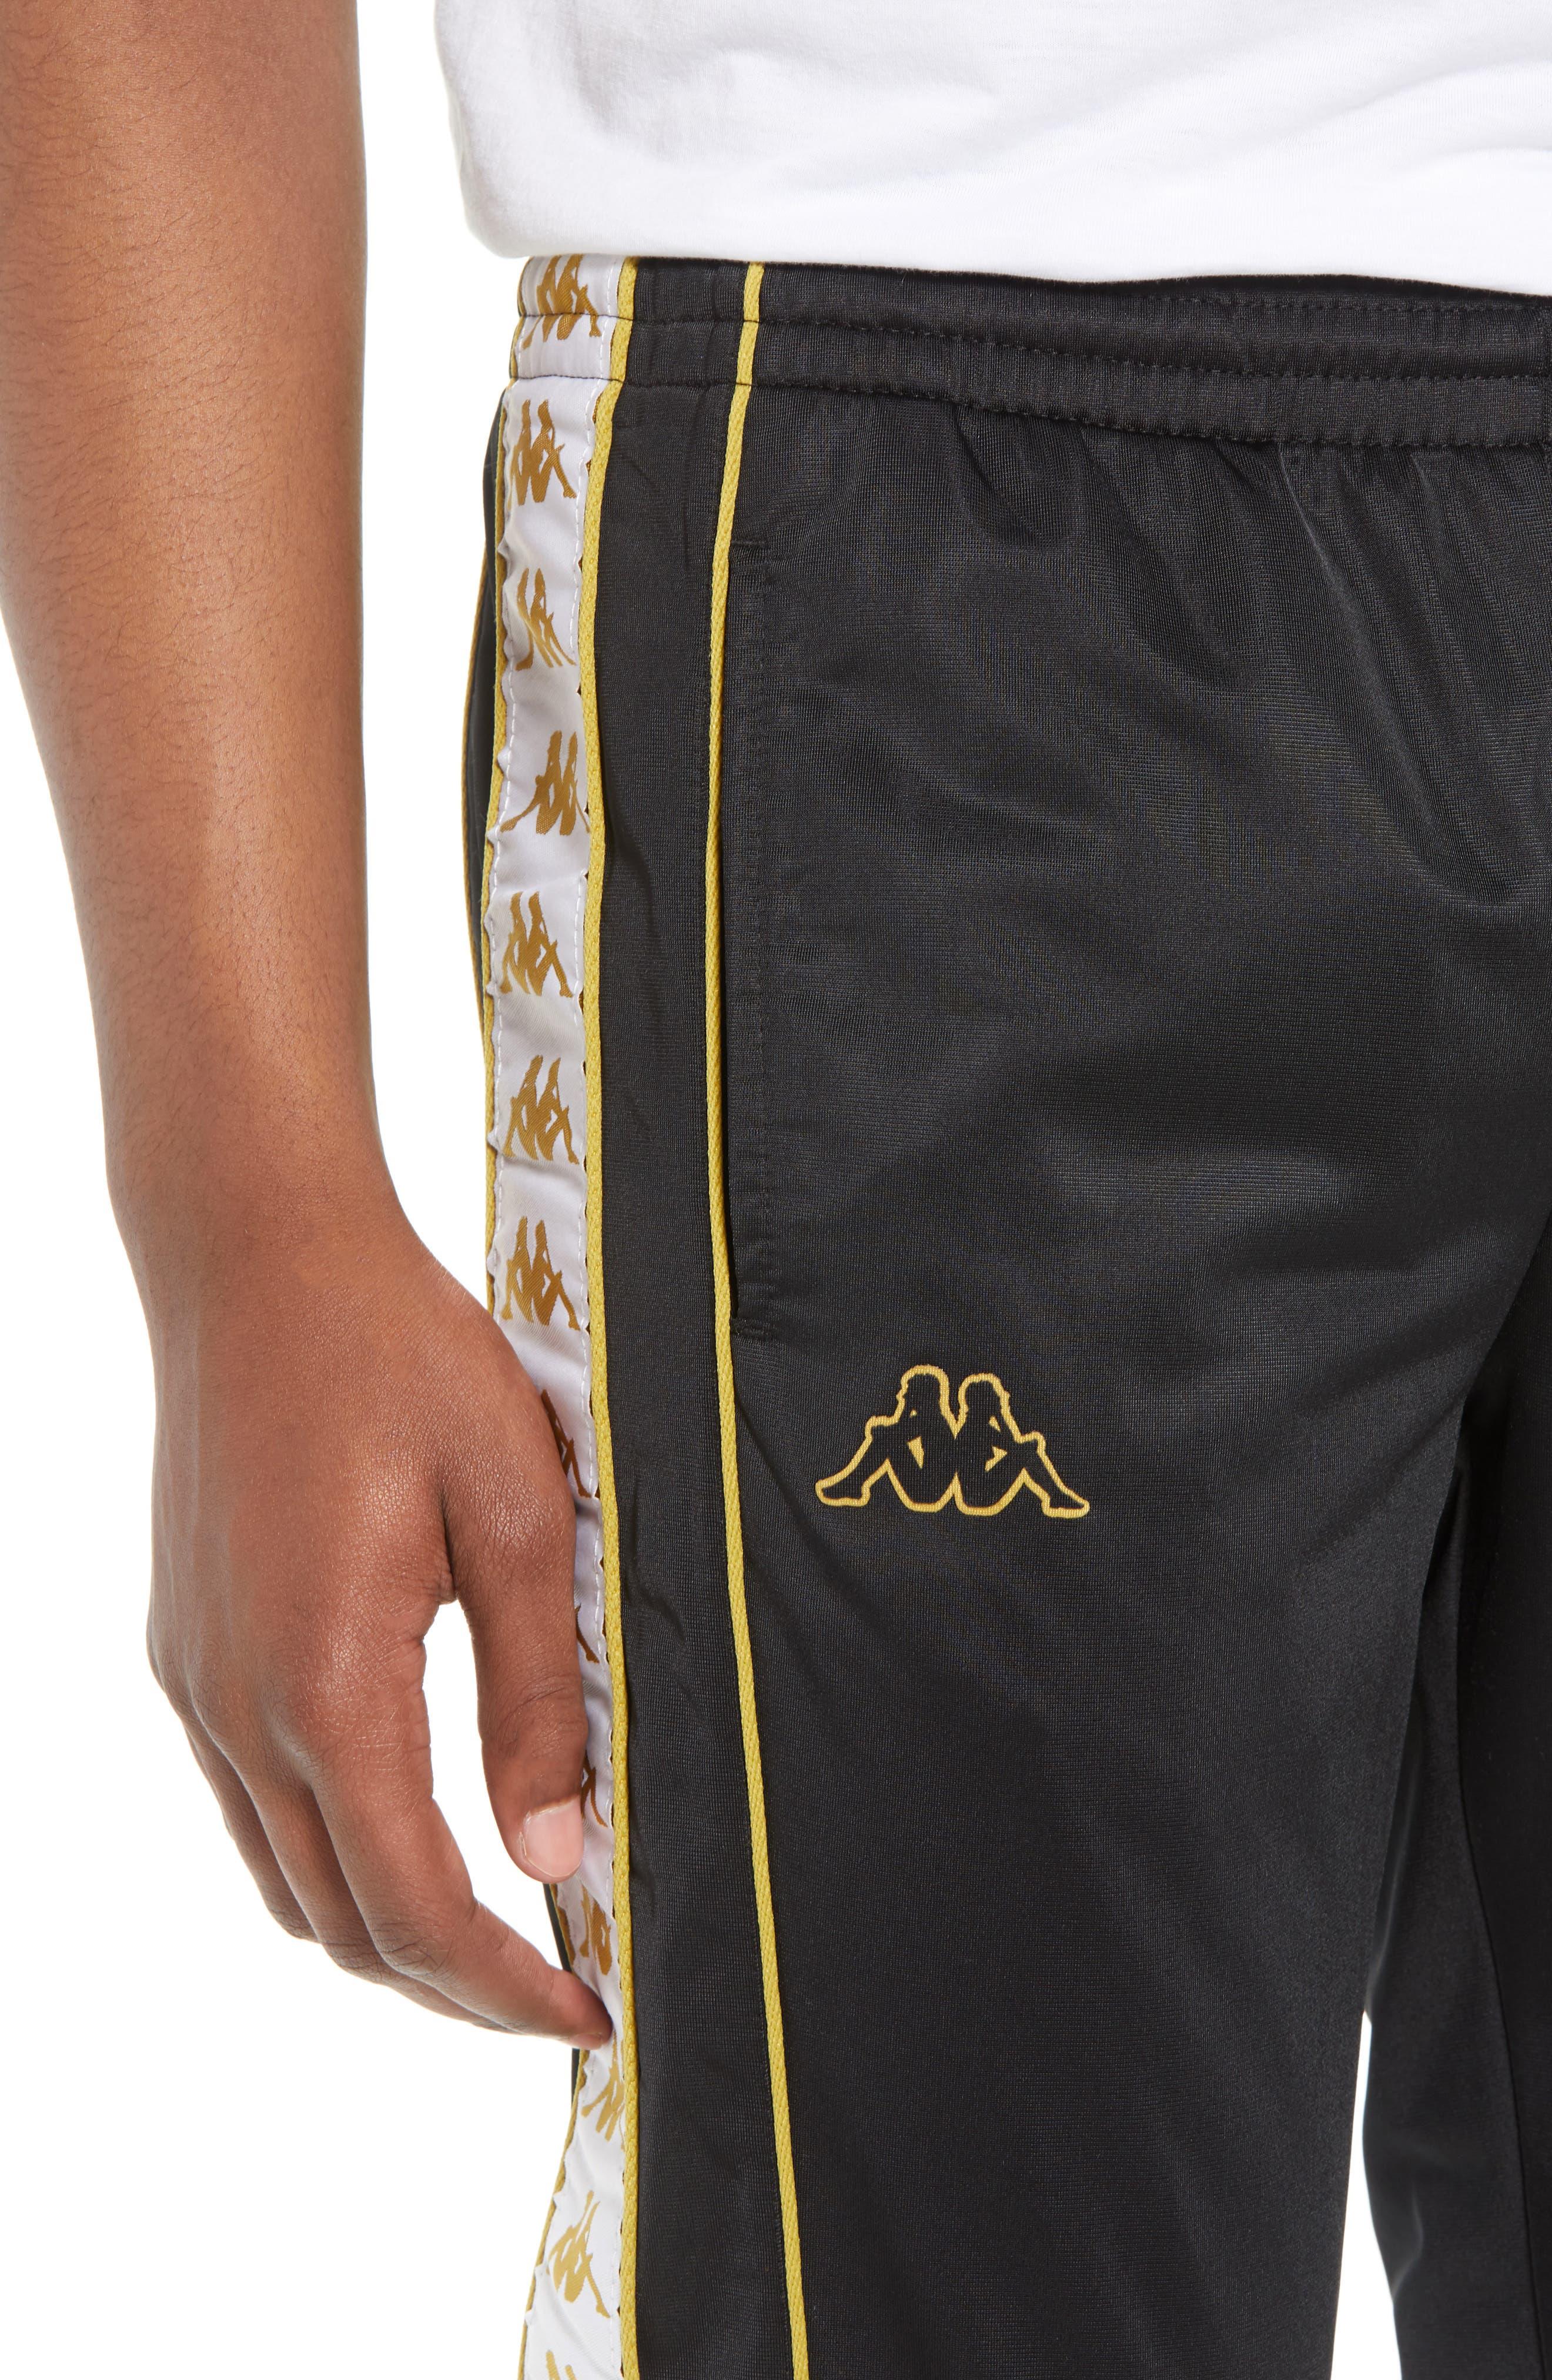 Racing Track Pants,                             Alternate thumbnail 4, color,                             Black/ White Gold